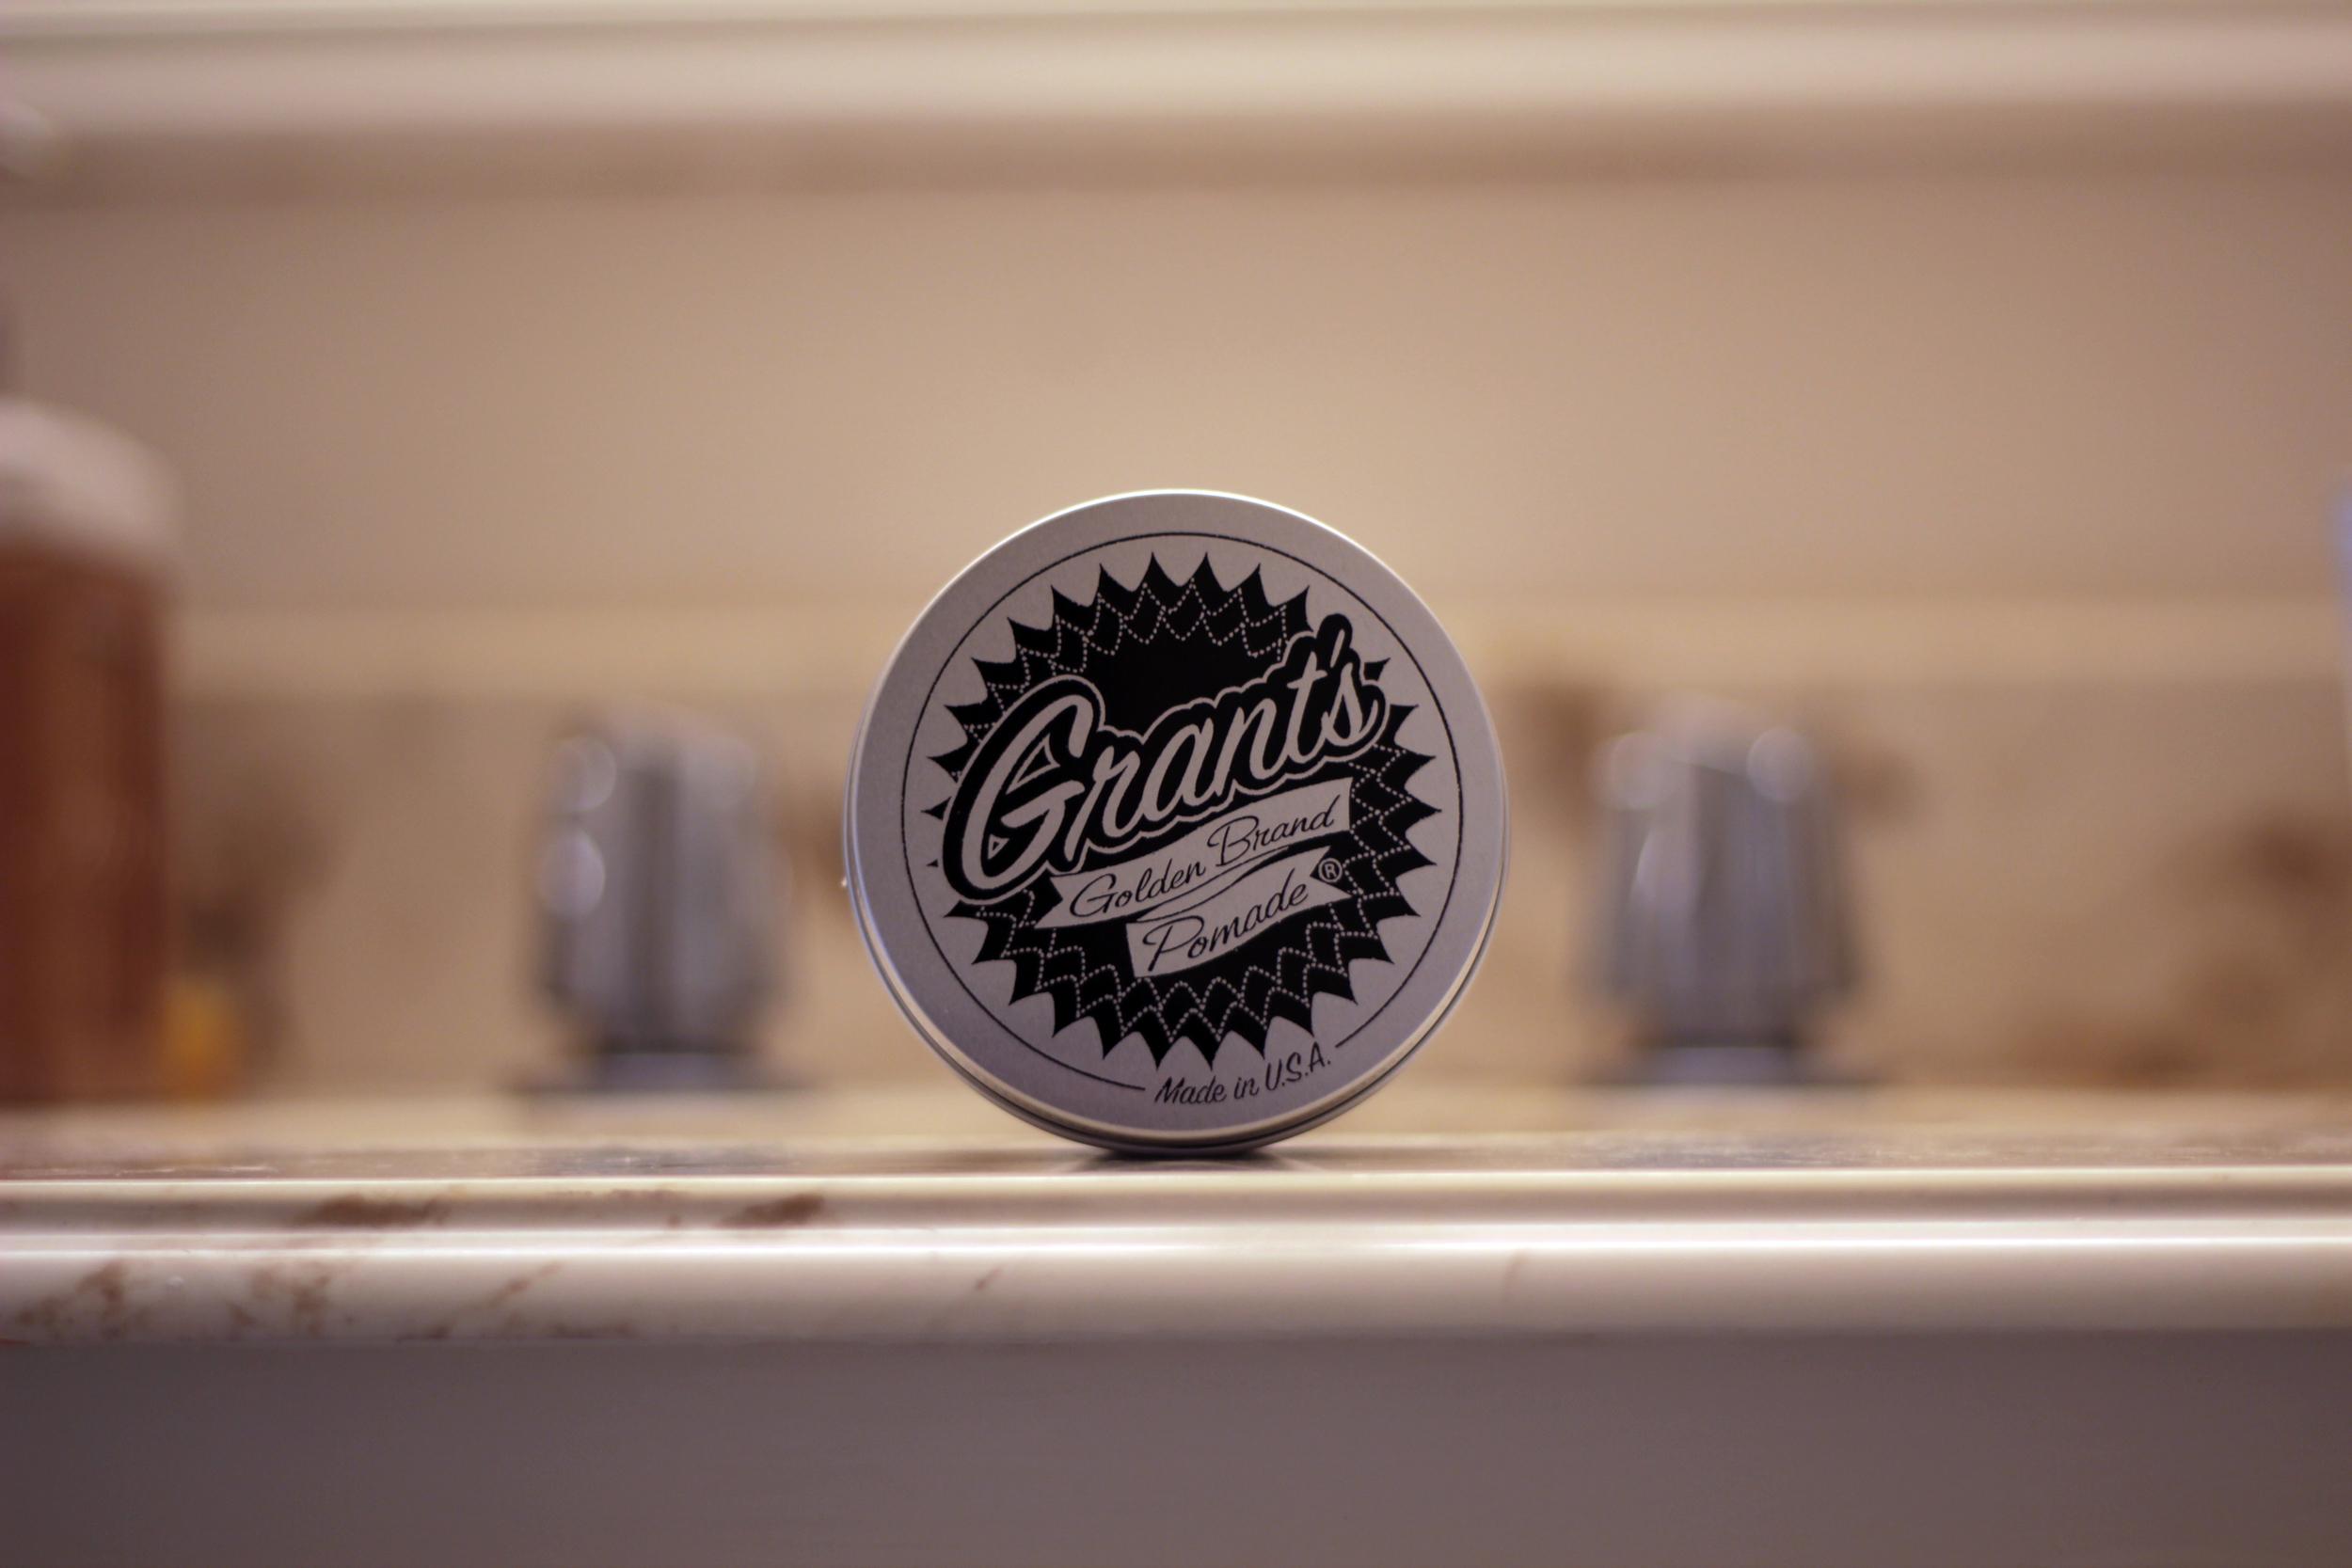 grant's golden brand pomade jar